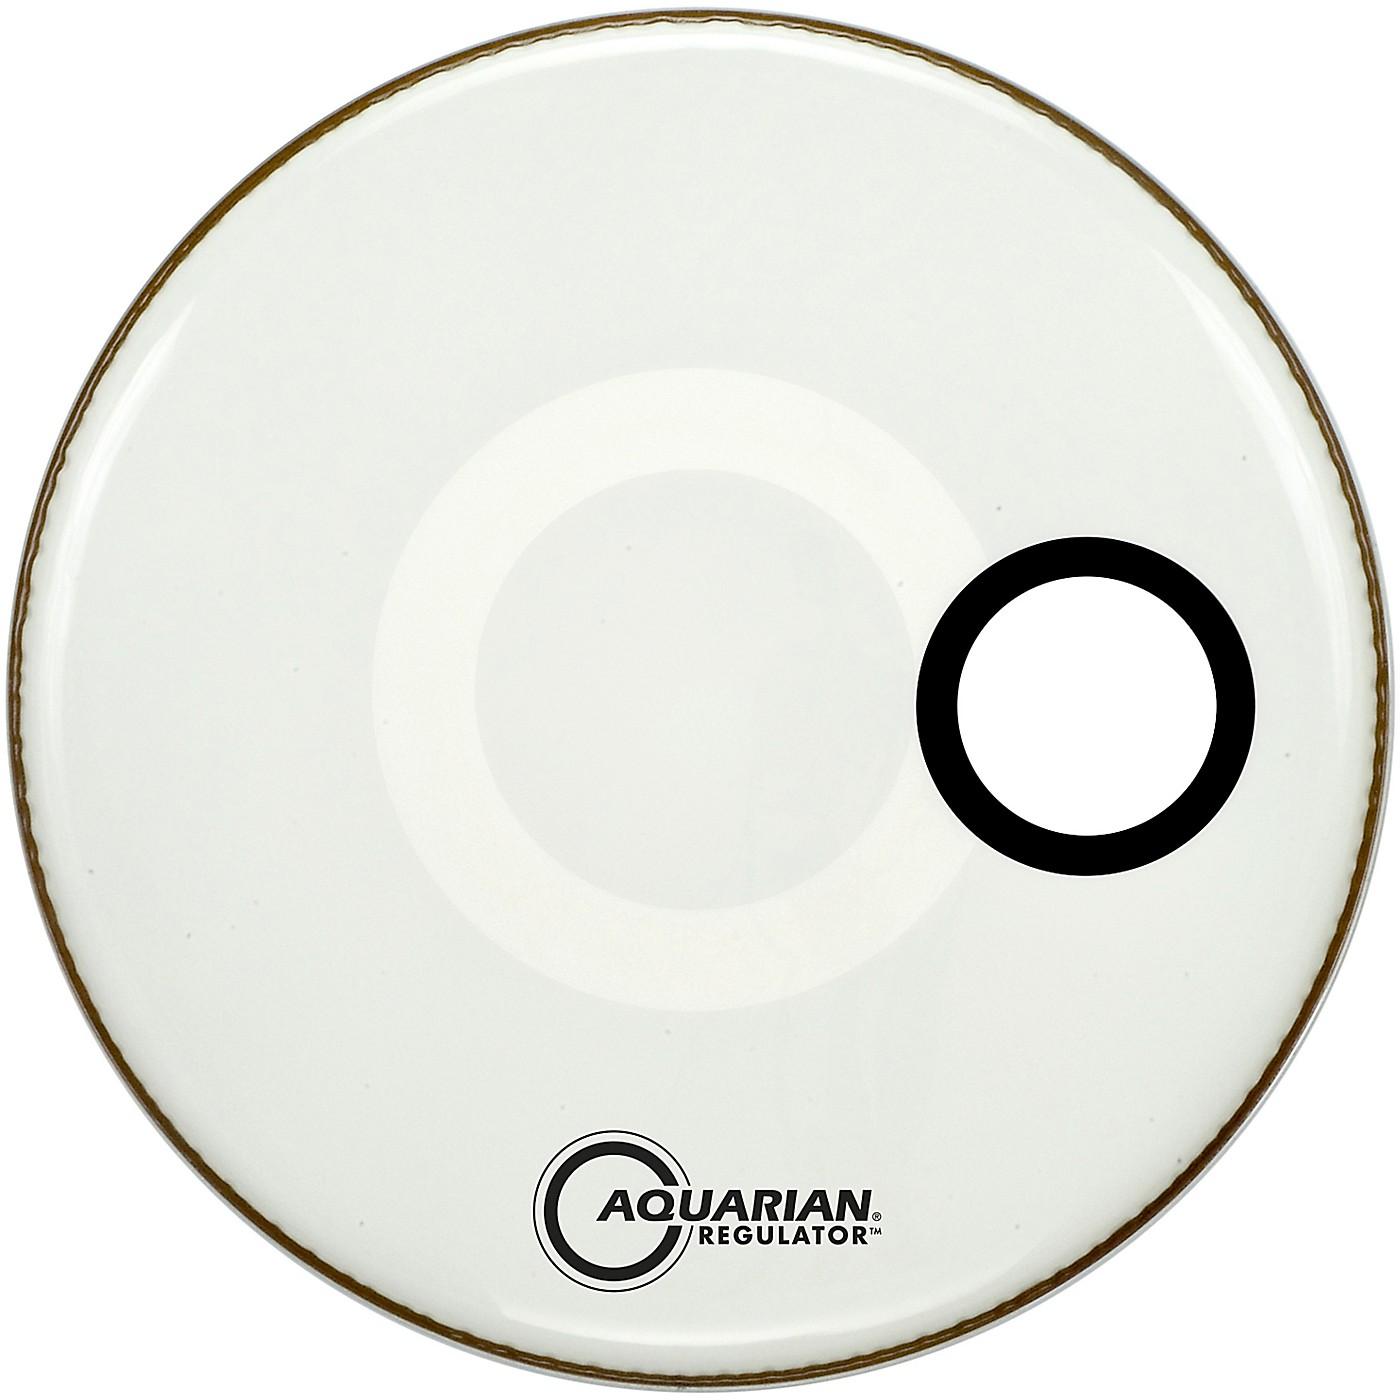 Aquarian Regulator Off-Set Hole Gloss White Bass Drum Head thumbnail